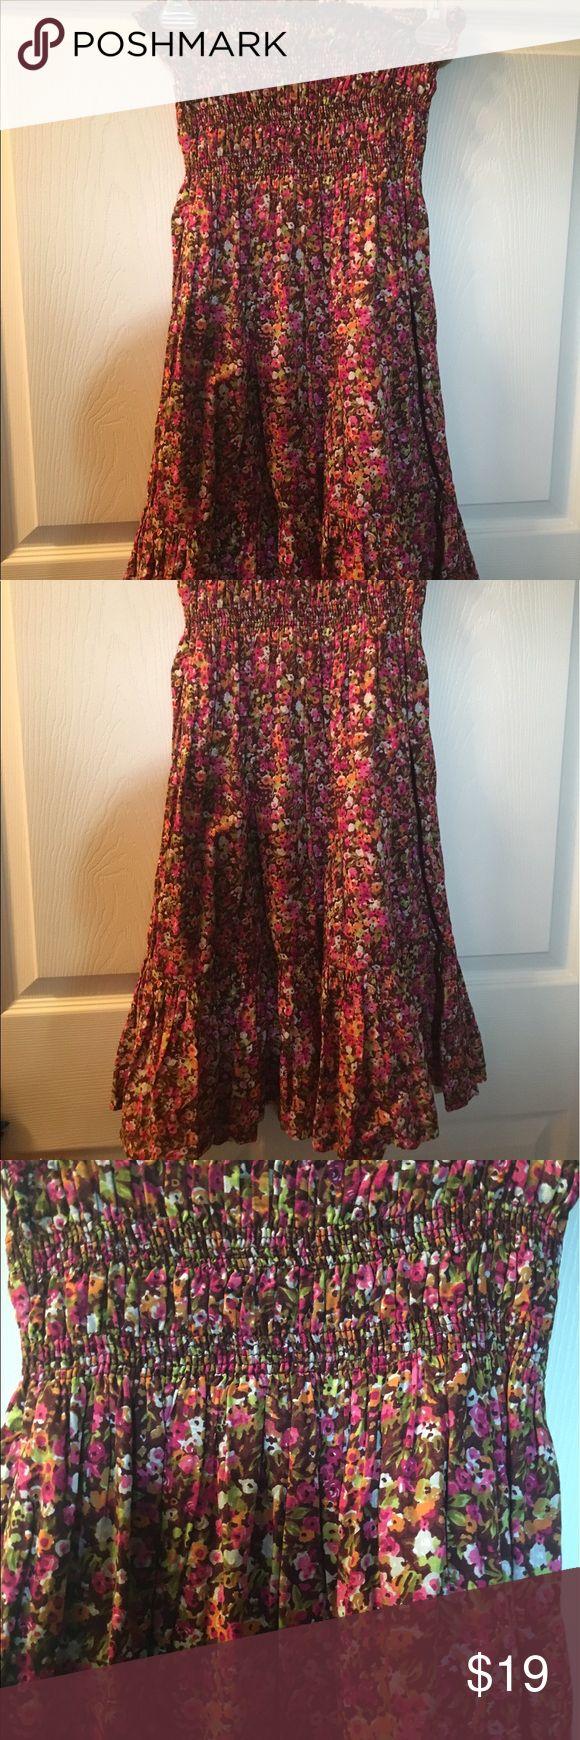 Summer VS DRESS Comfy and fun for beach, vacations or BBQs! PINK Victoria's Secret Dresses Maxi